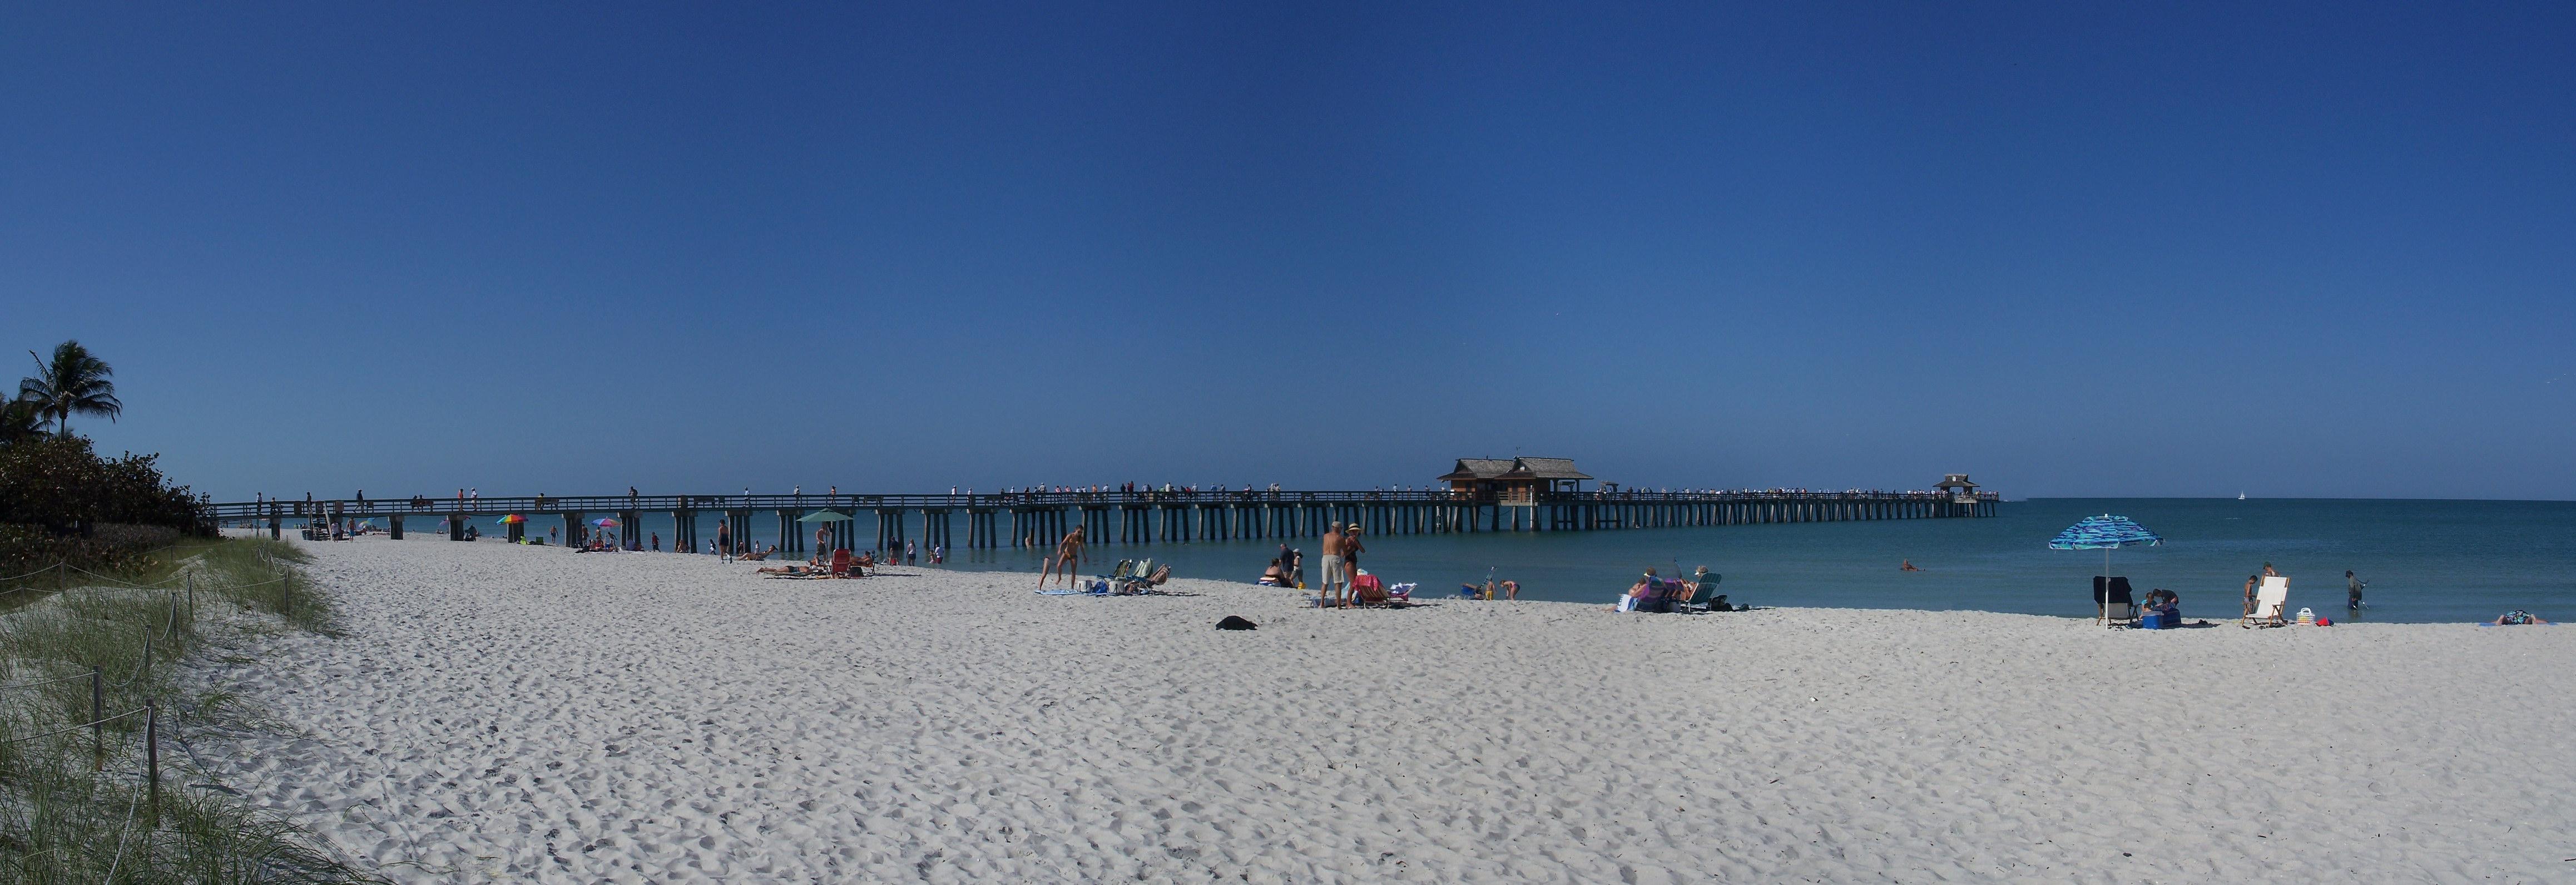 Naples Florida Beach Resorts For Families